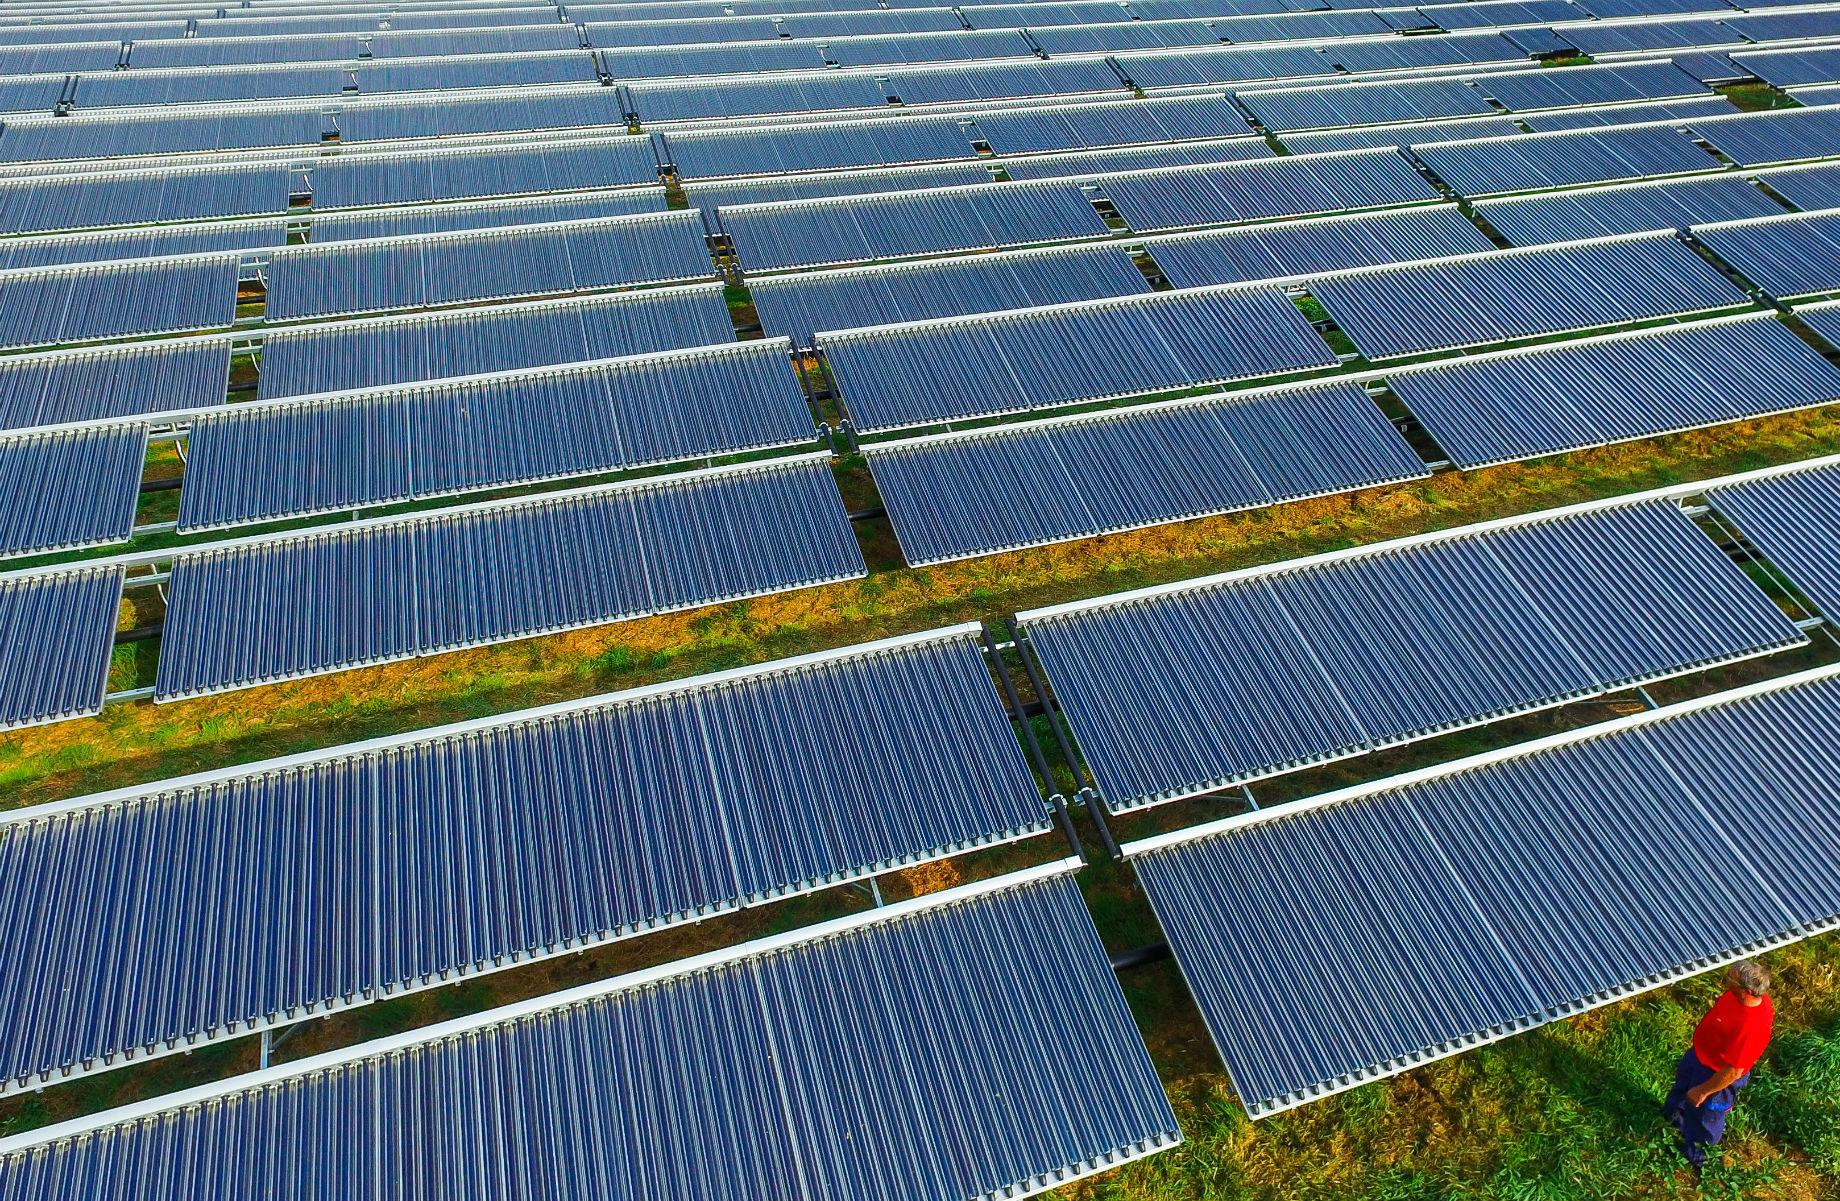 Parque solar/ Foto de Patrick Pleul/ DPA/ AFP